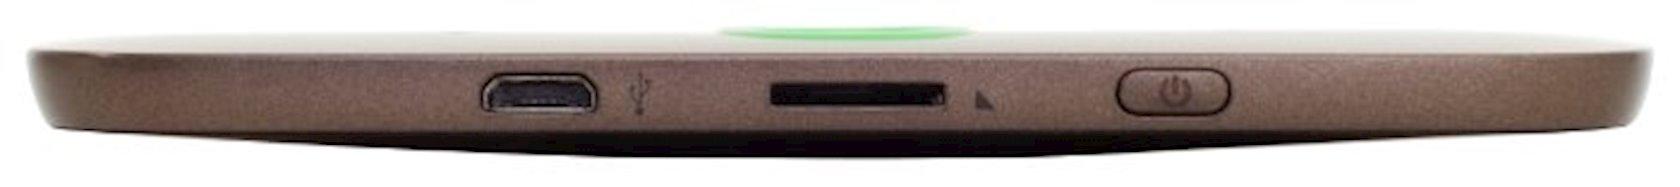 Elektron kitab PocketBook 615 Dark Brown